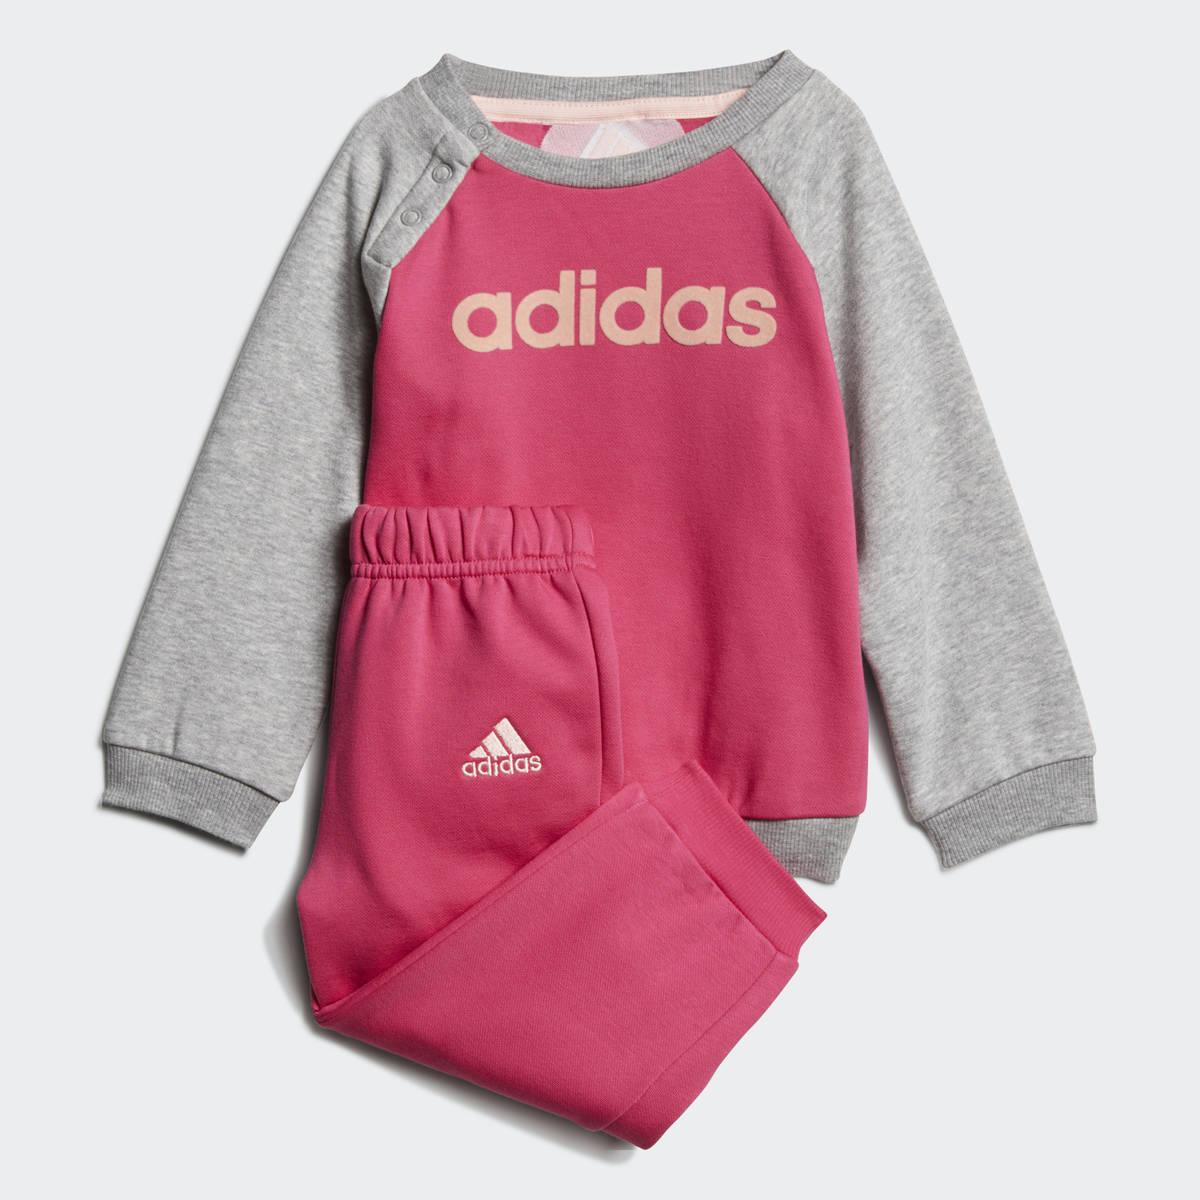 Adidas lasten collegepuku Linear punaharmaa - Urheilujakone.fi ... b6e60ade9b